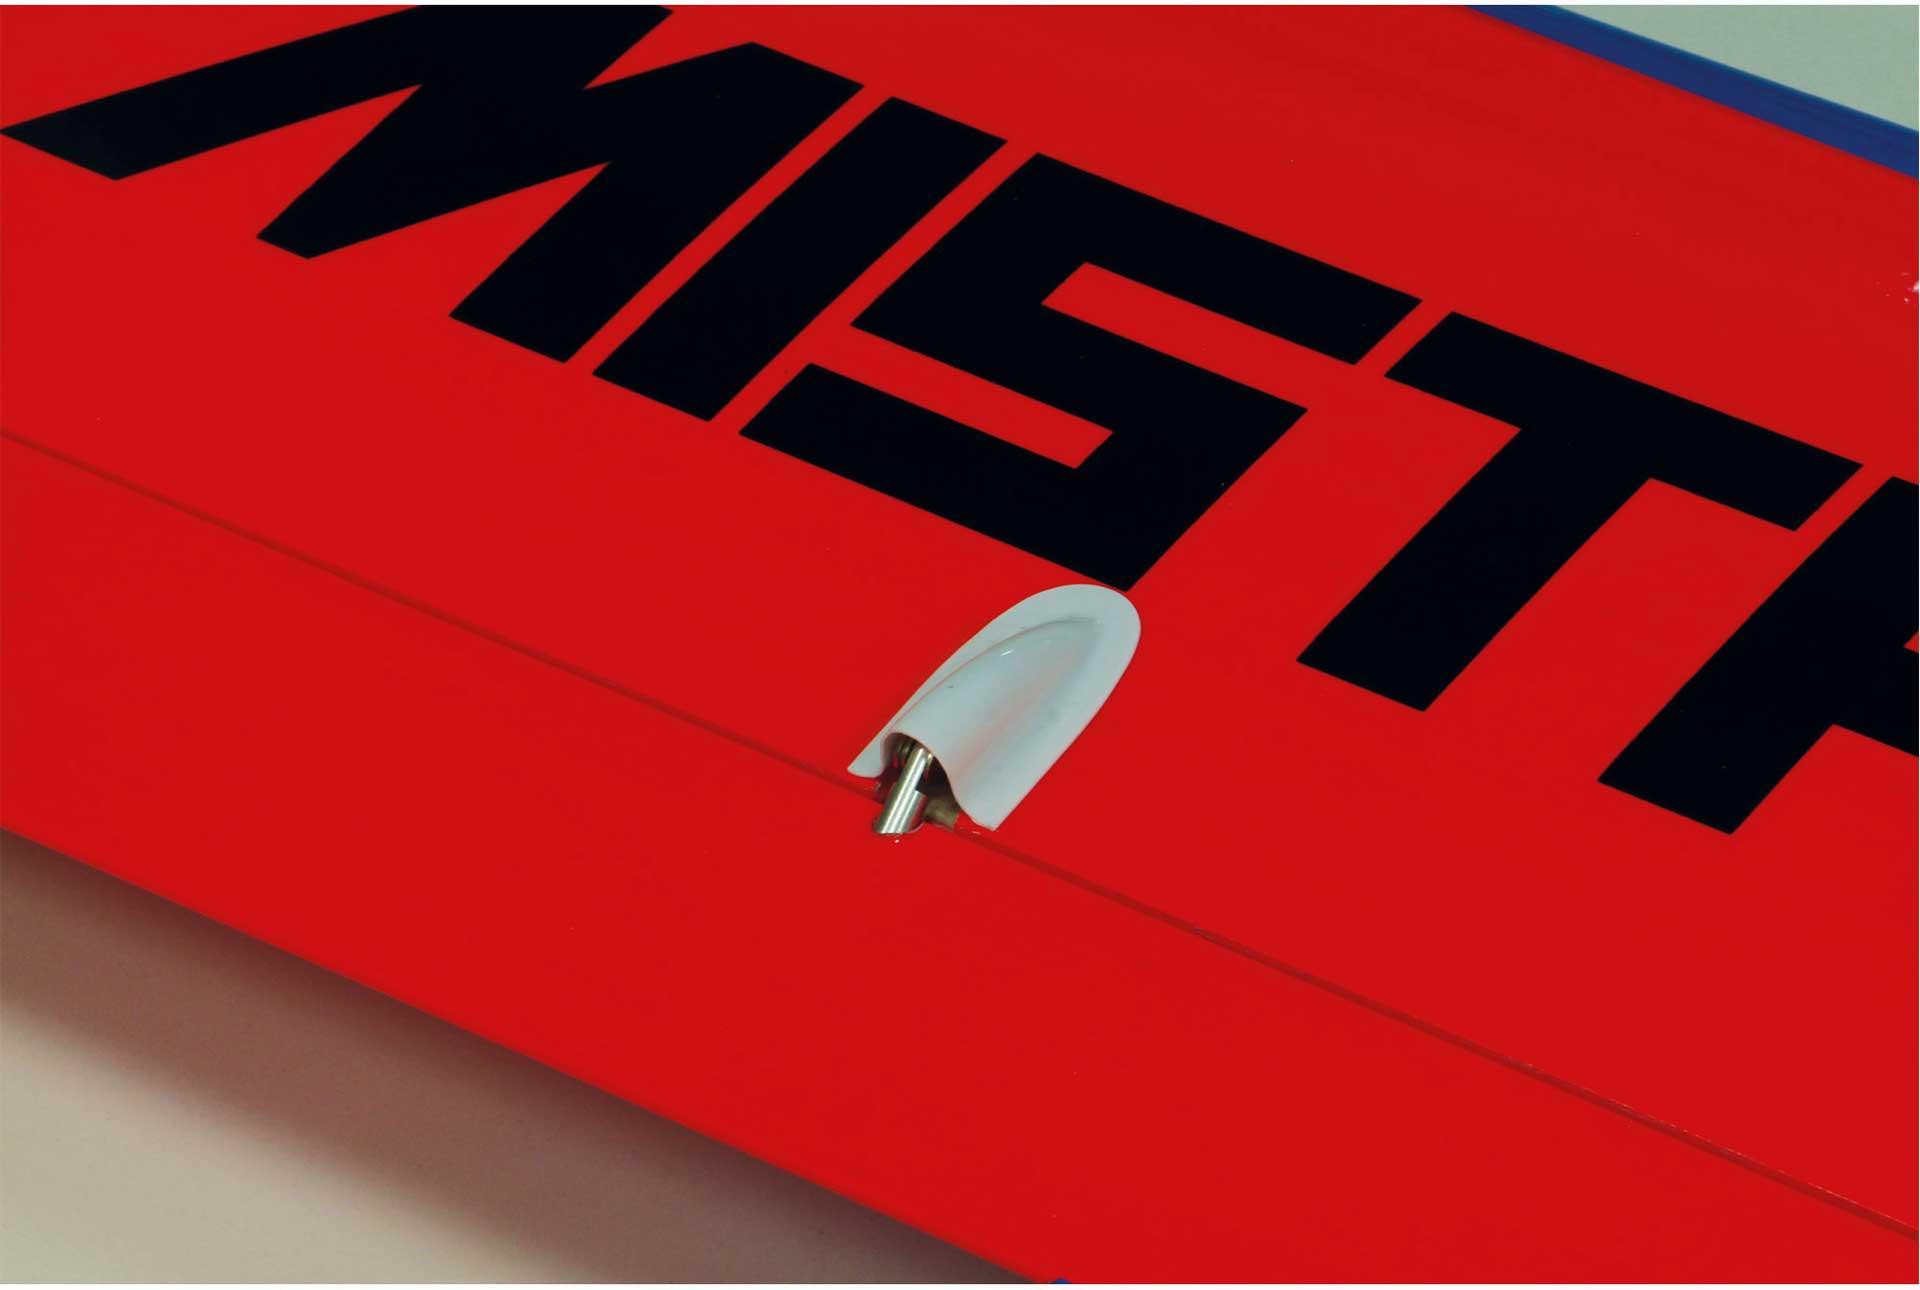 Robbe Modellsport MISTRAL 2.0 PNP STYRO/GRP/ABACHI WINGS